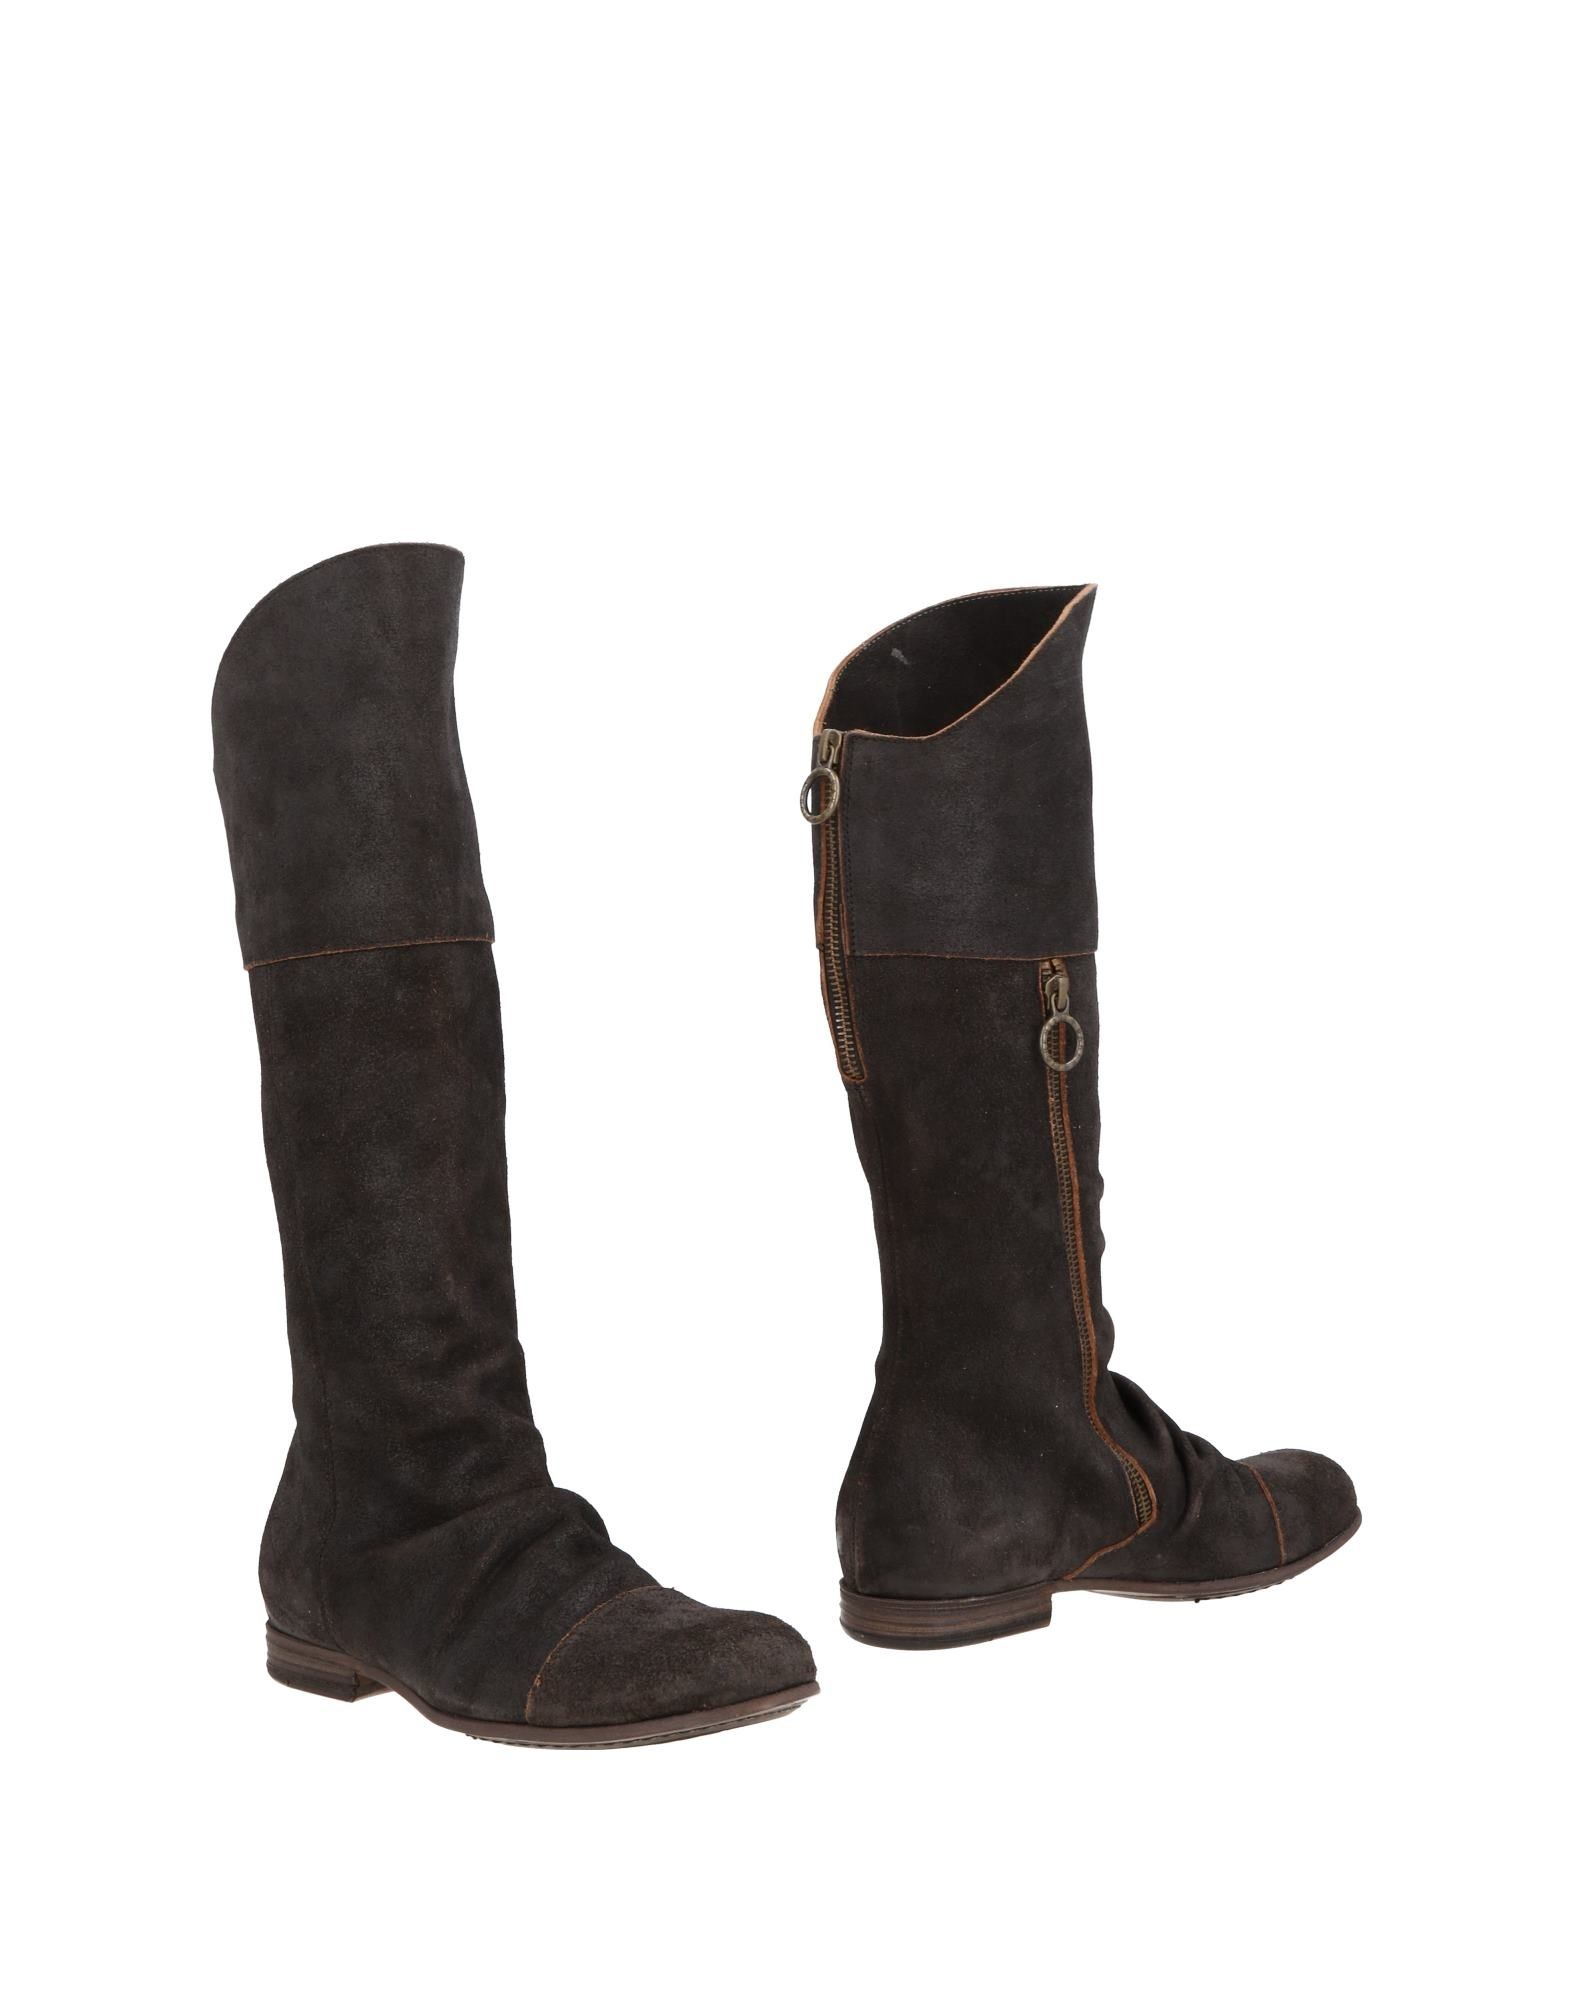 Fiorentini+Baker Boots - Women Fiorentini+Baker Boots - online on  Canada - Boots 11499398CO 2ea1e1